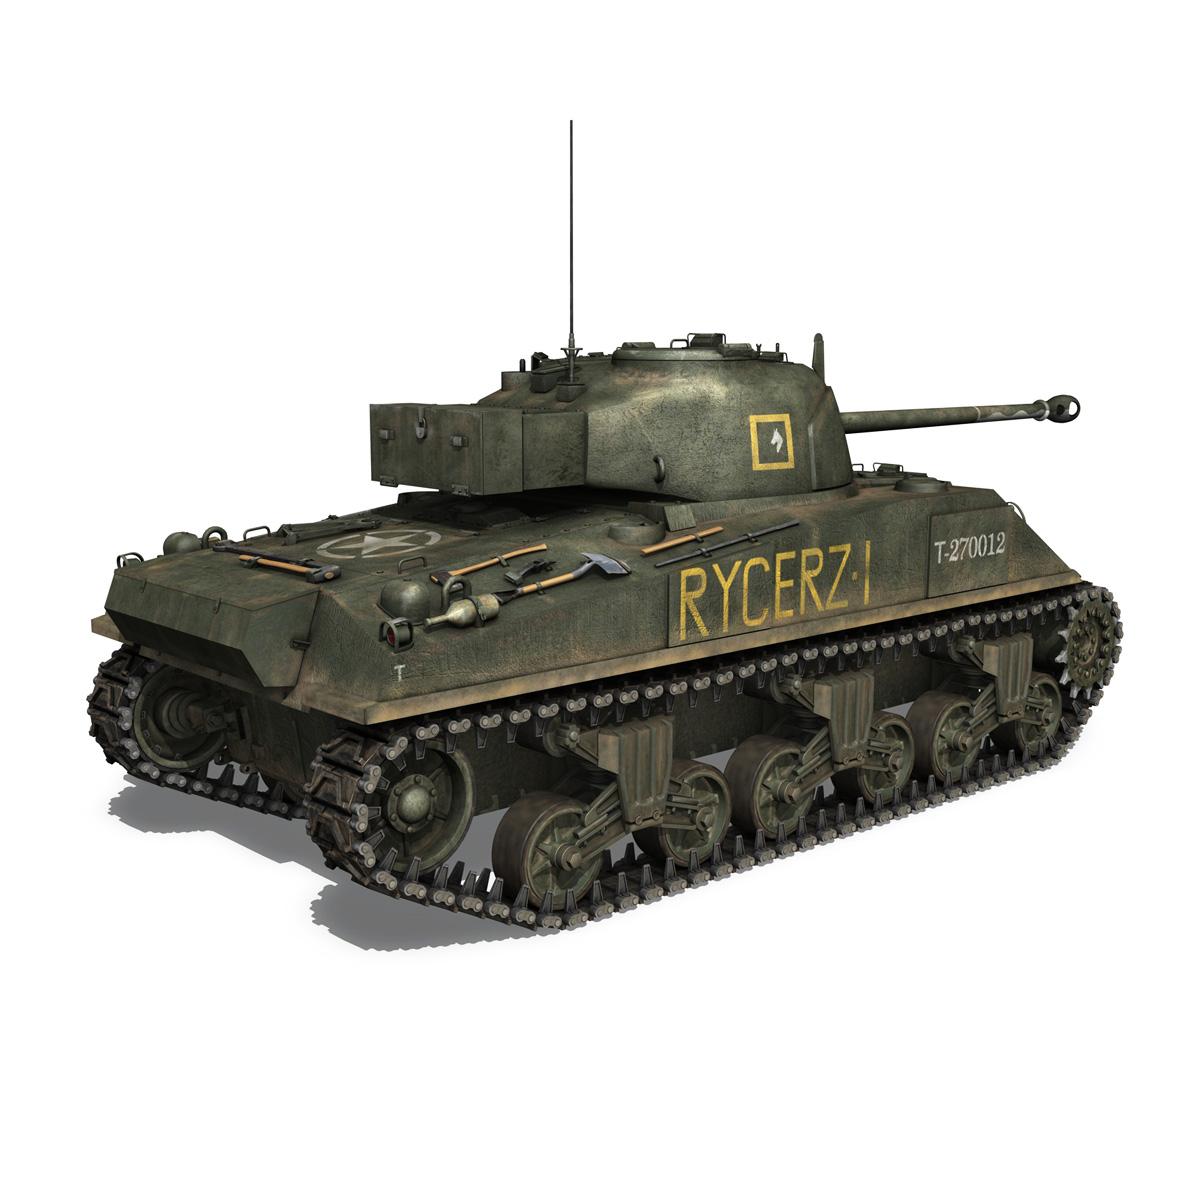 sherman mk vc firefly - rycerz i 3d modelis 3ds fbx c4d lwo obj 273073